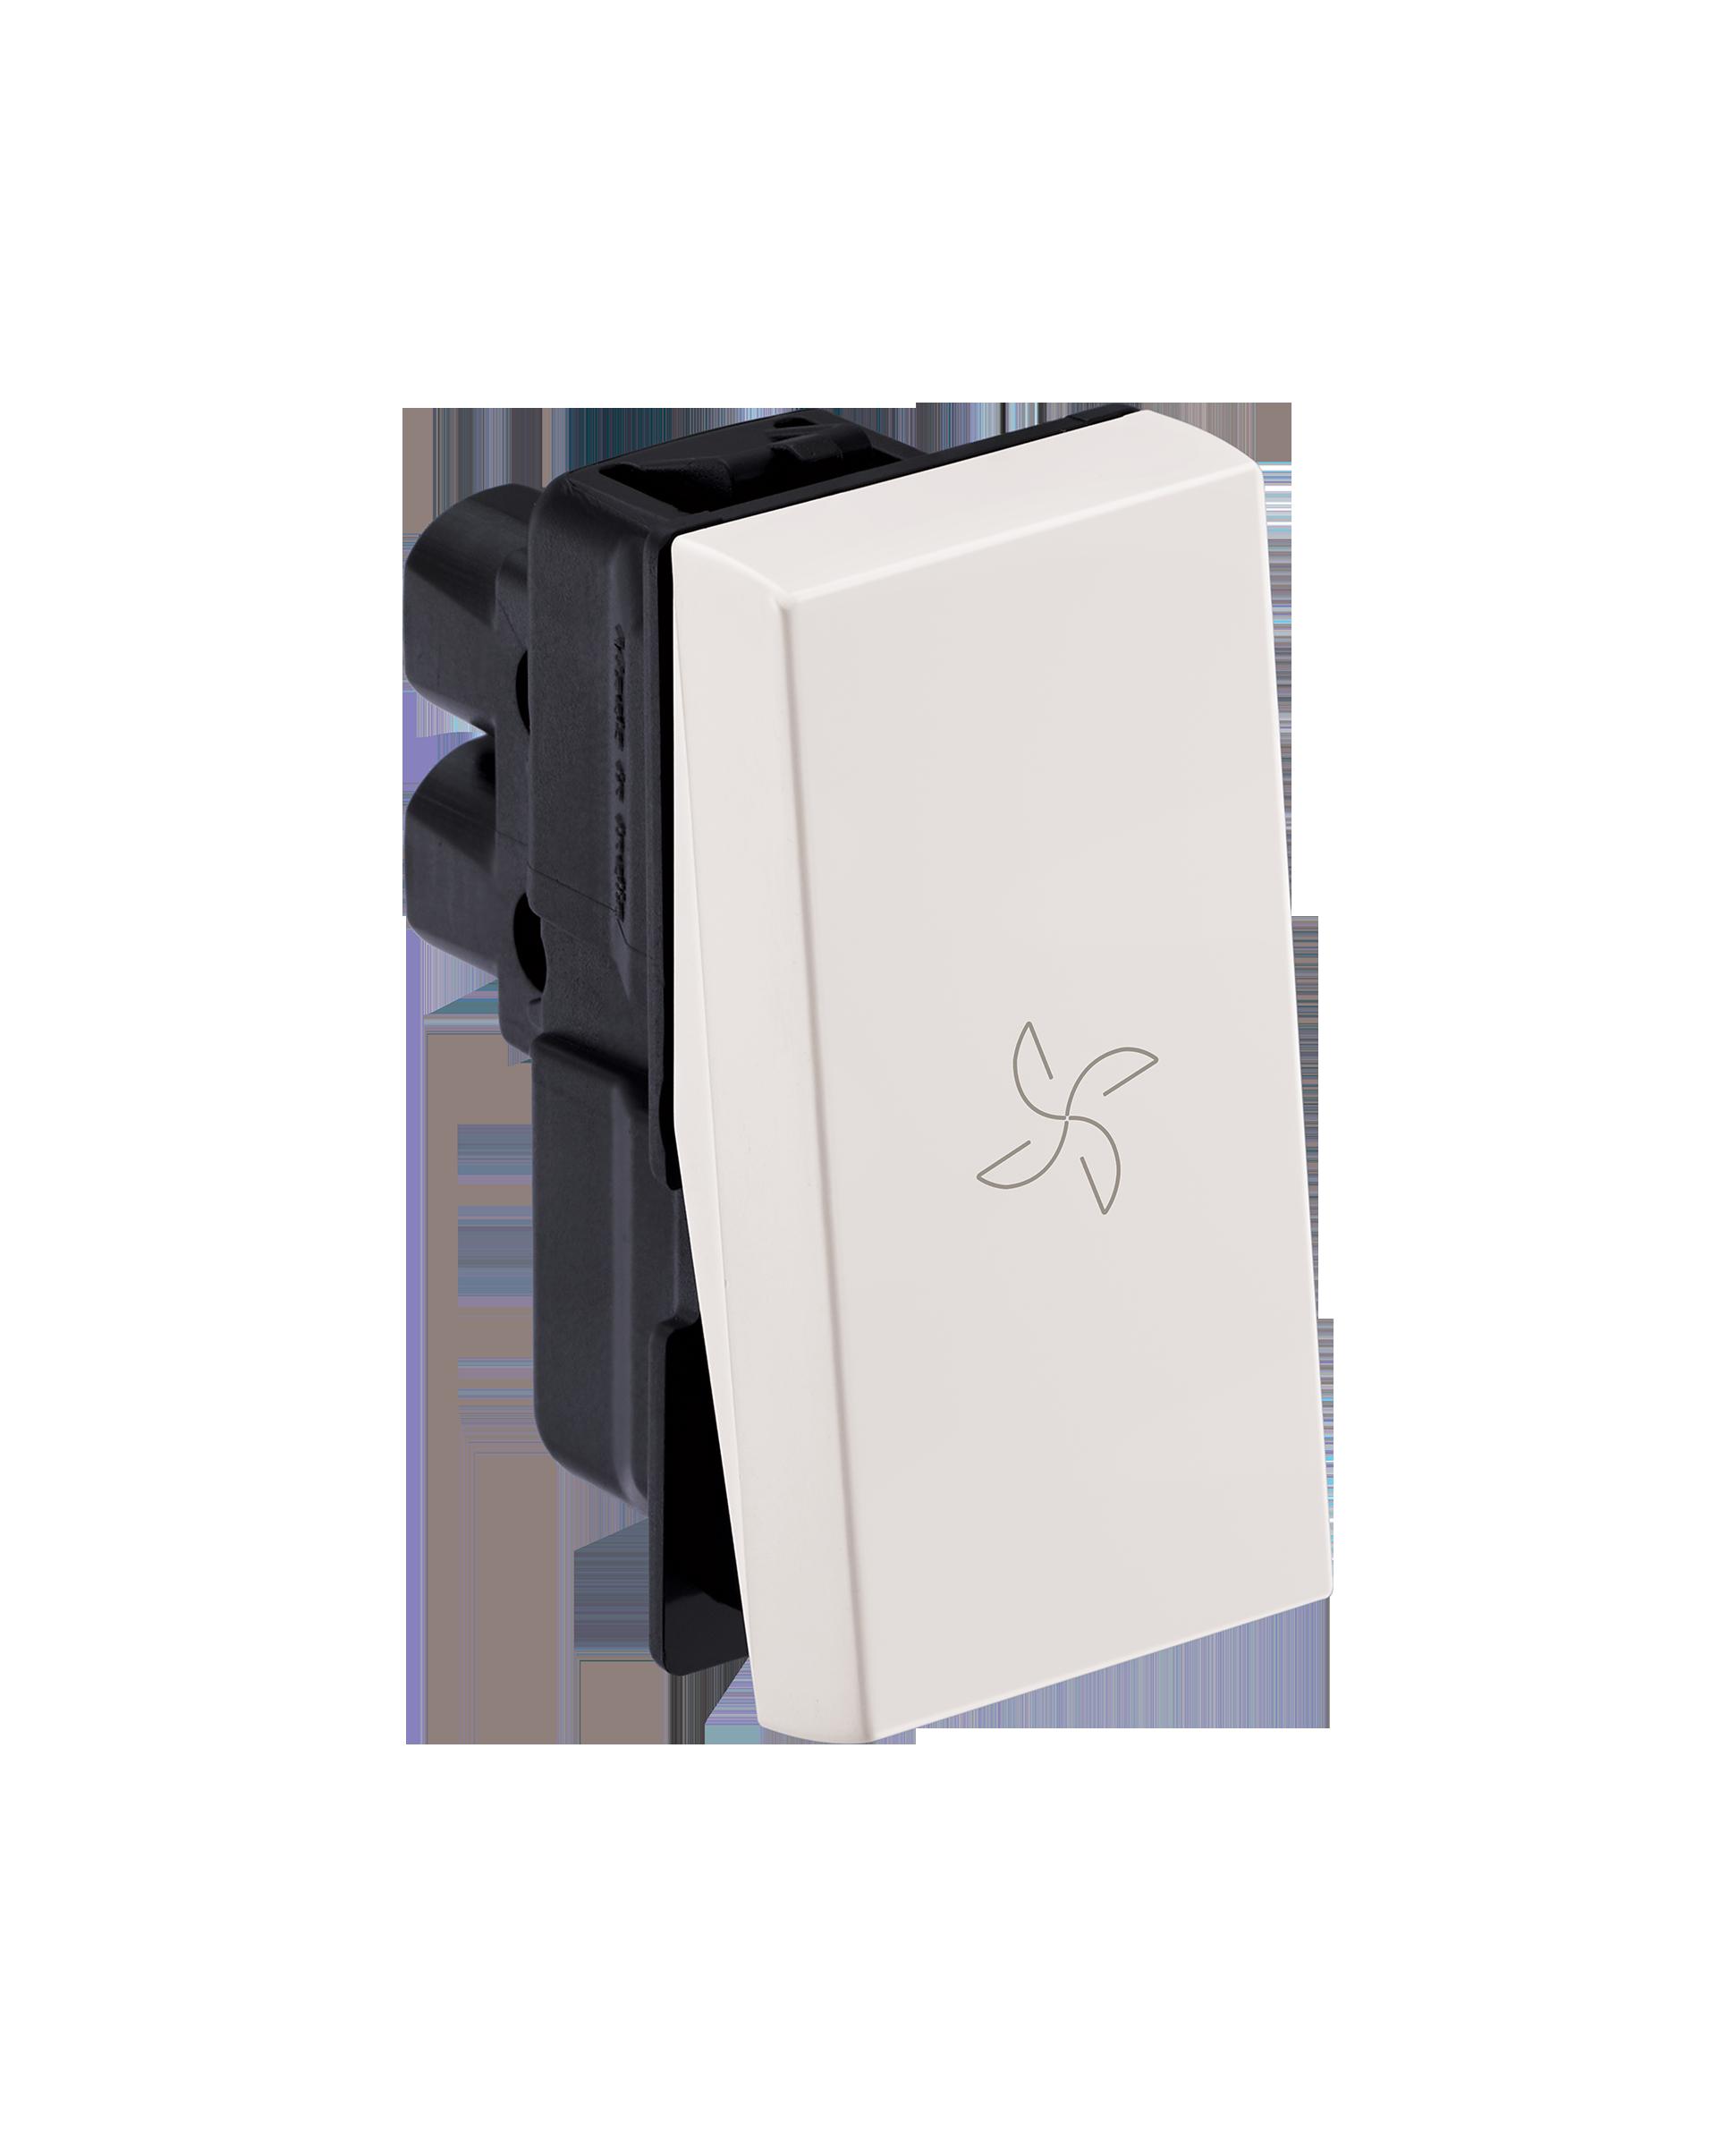 Myrius Nextgen 6A Switch 1 Way 1M With Fan Marking White